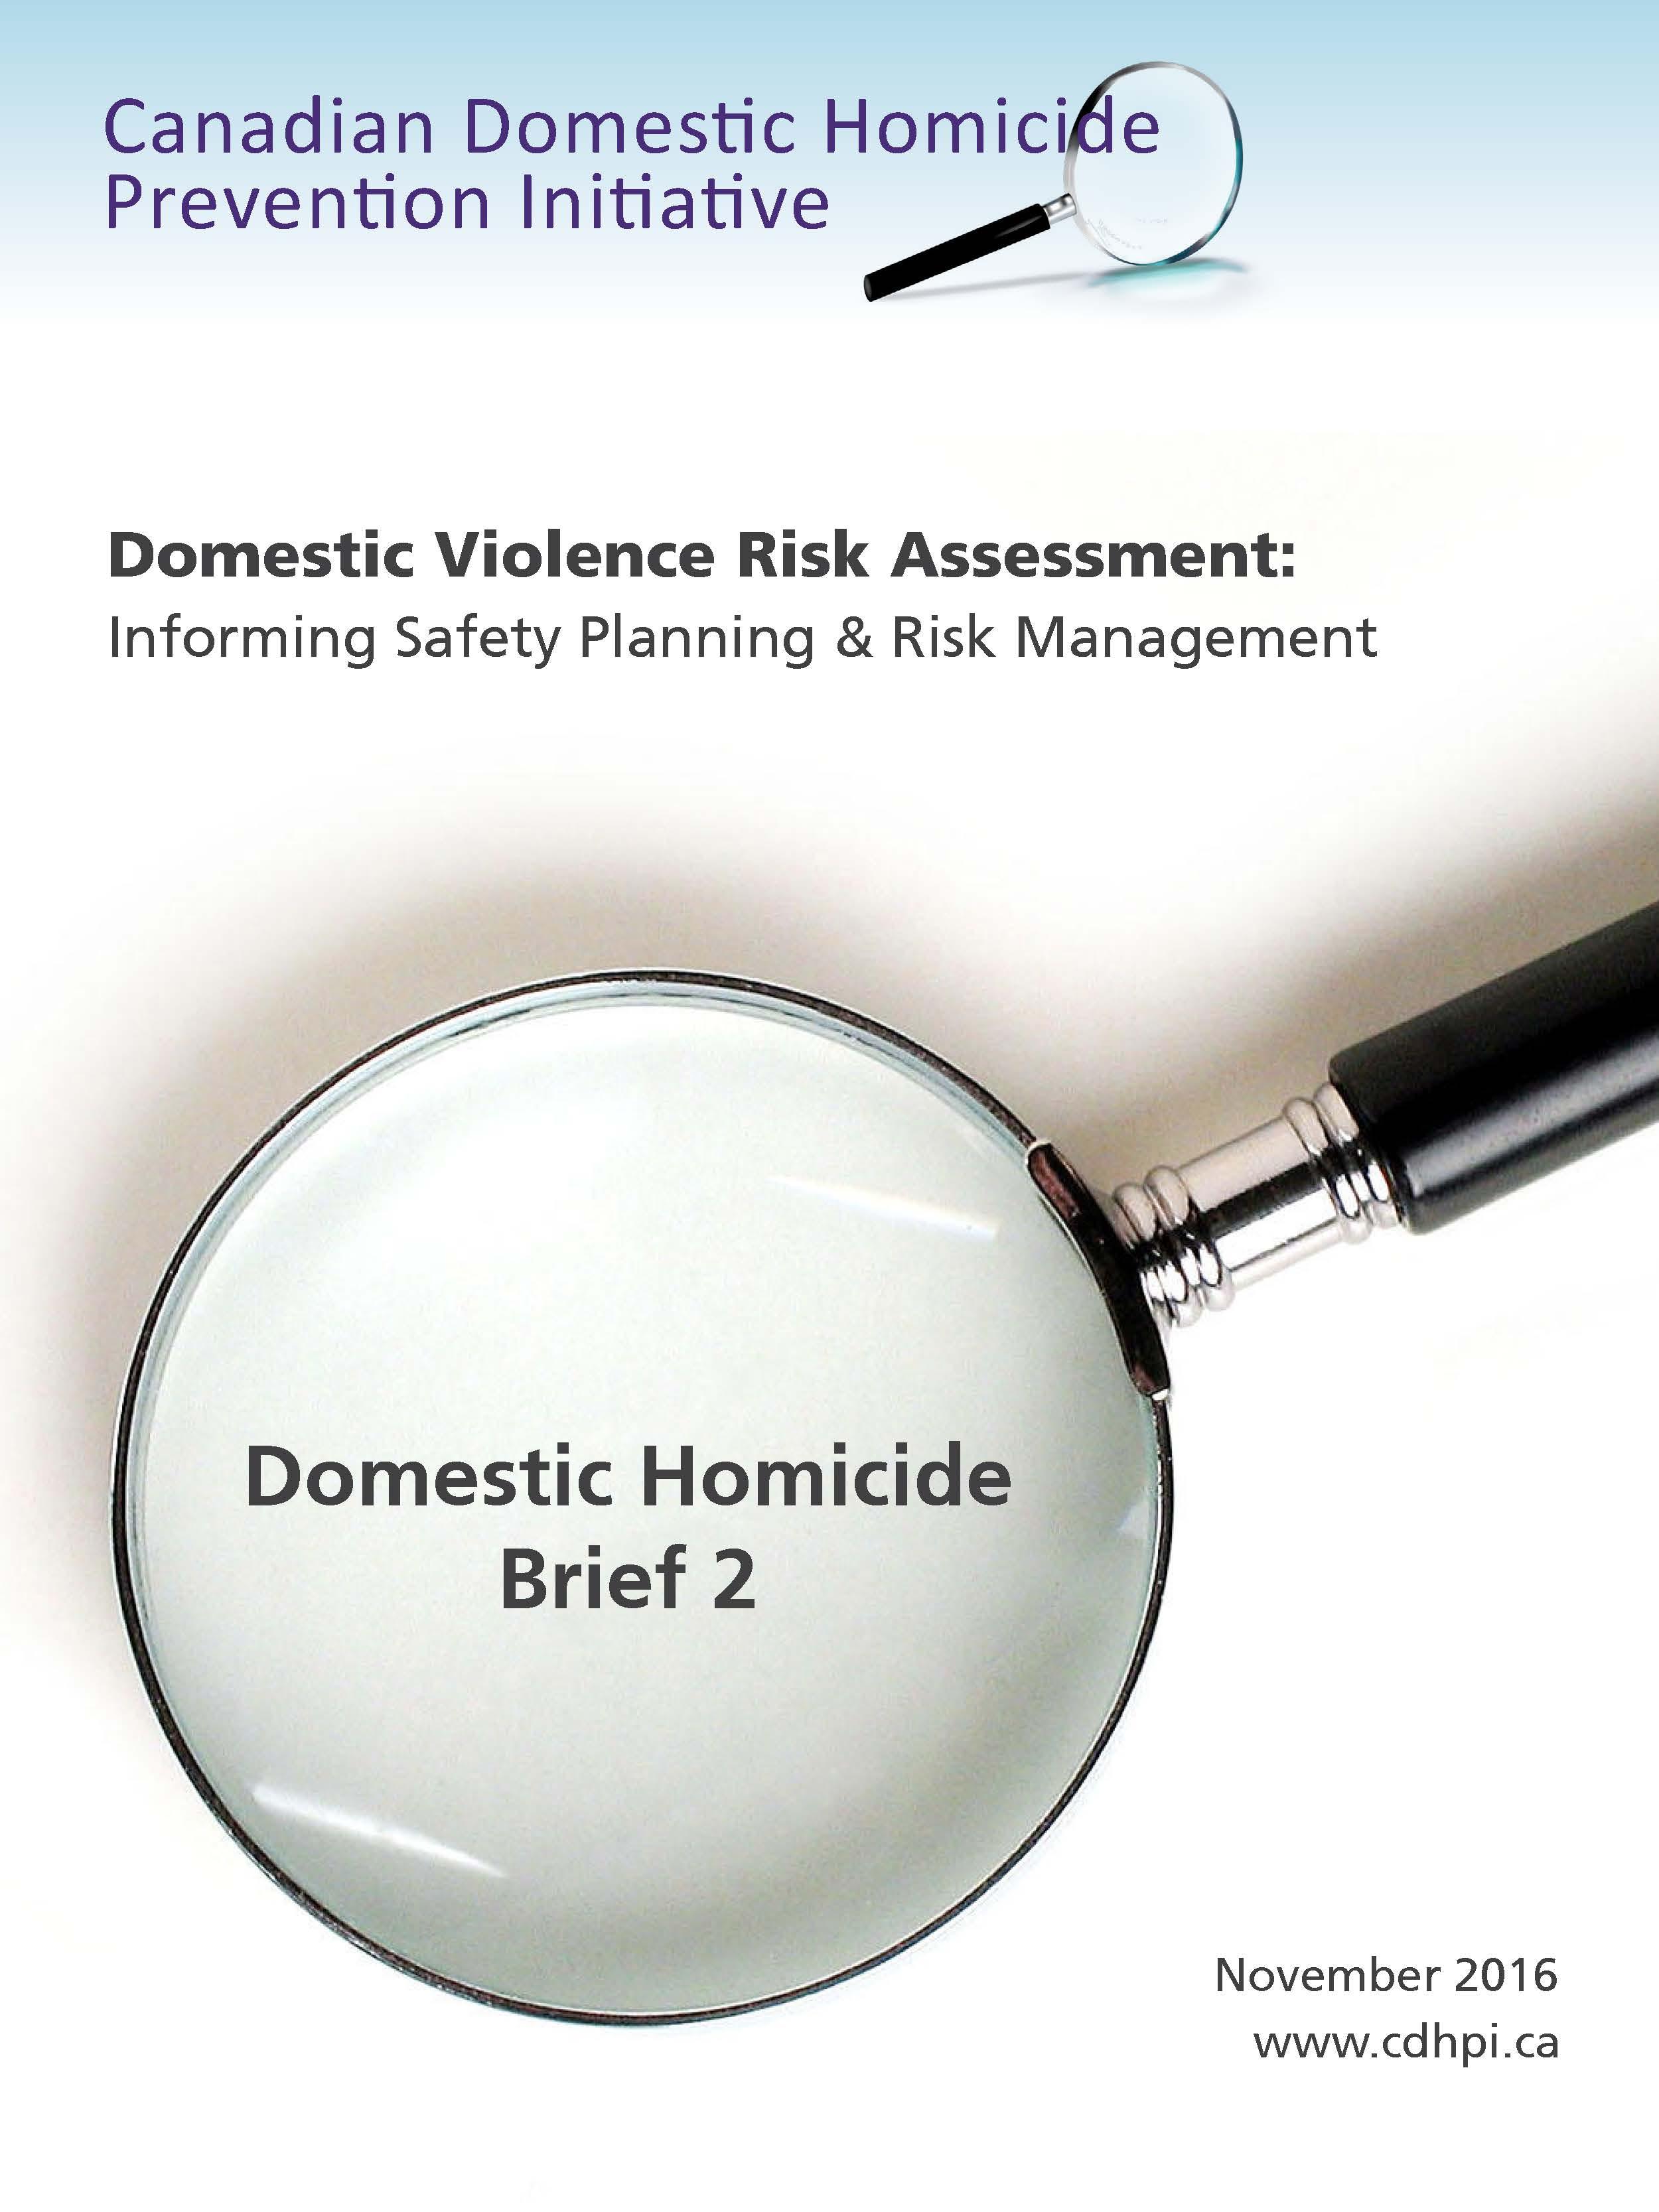 Domestic Violence Risk Assessment: Informing Safety Planning & Risk Management Report Cover